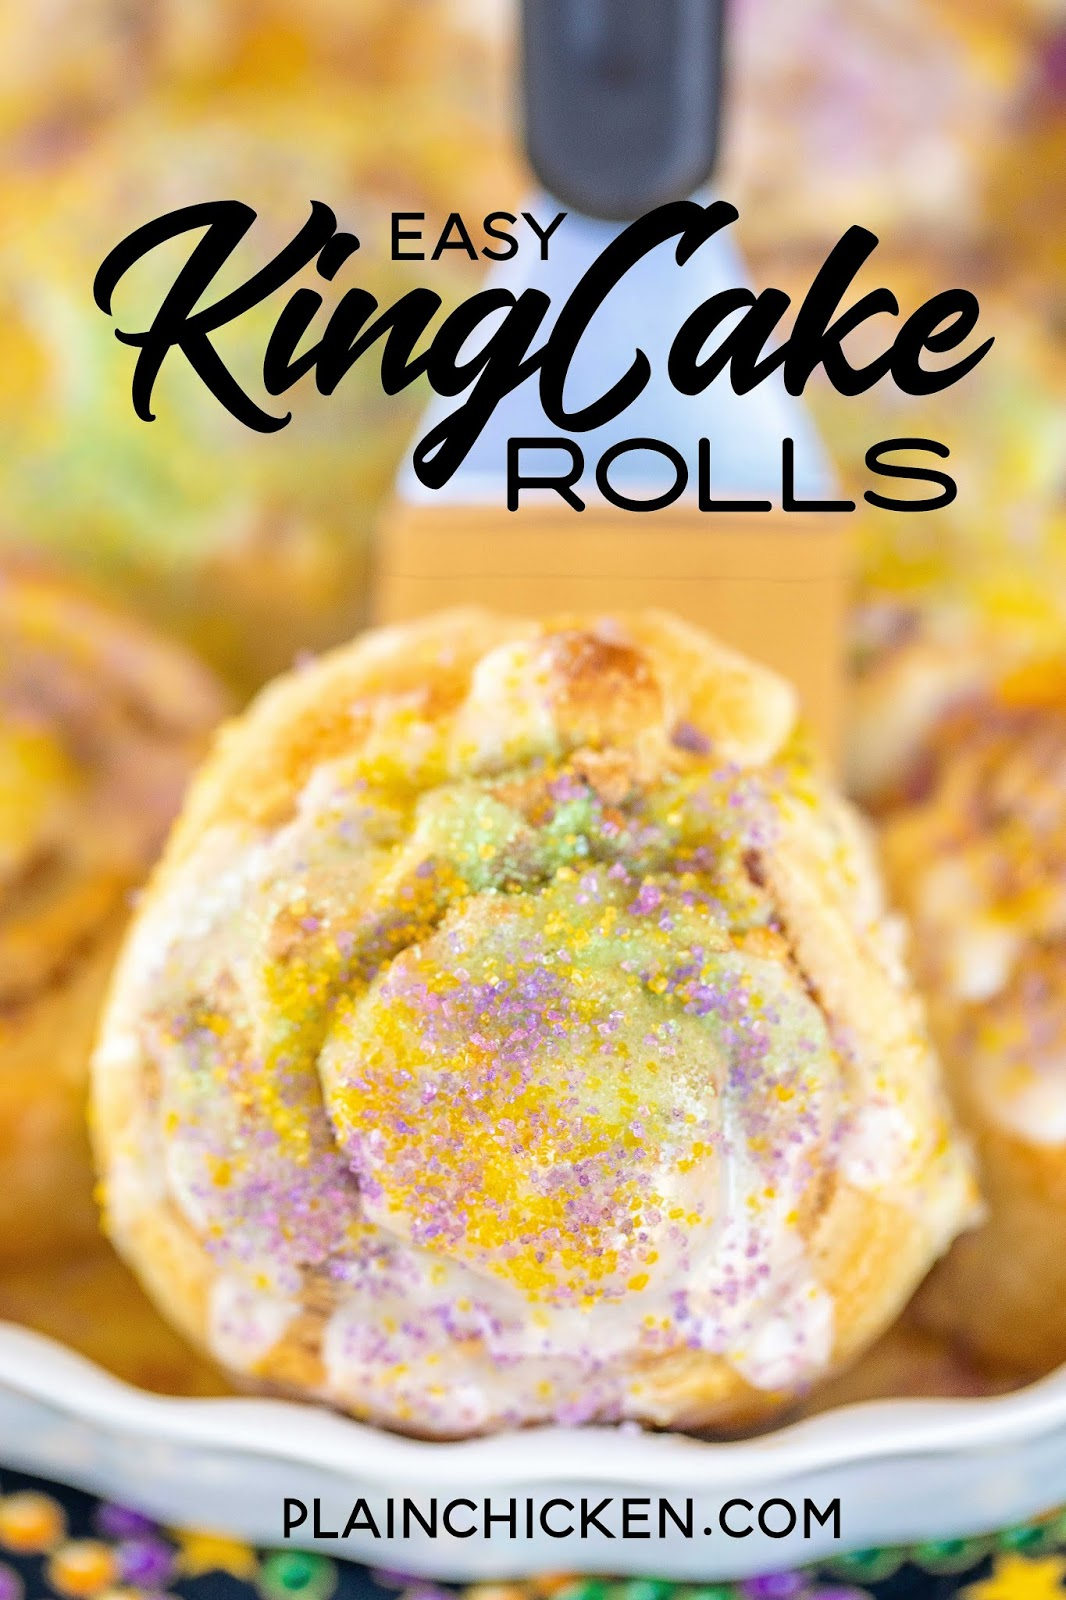 king cake roll on a spatula